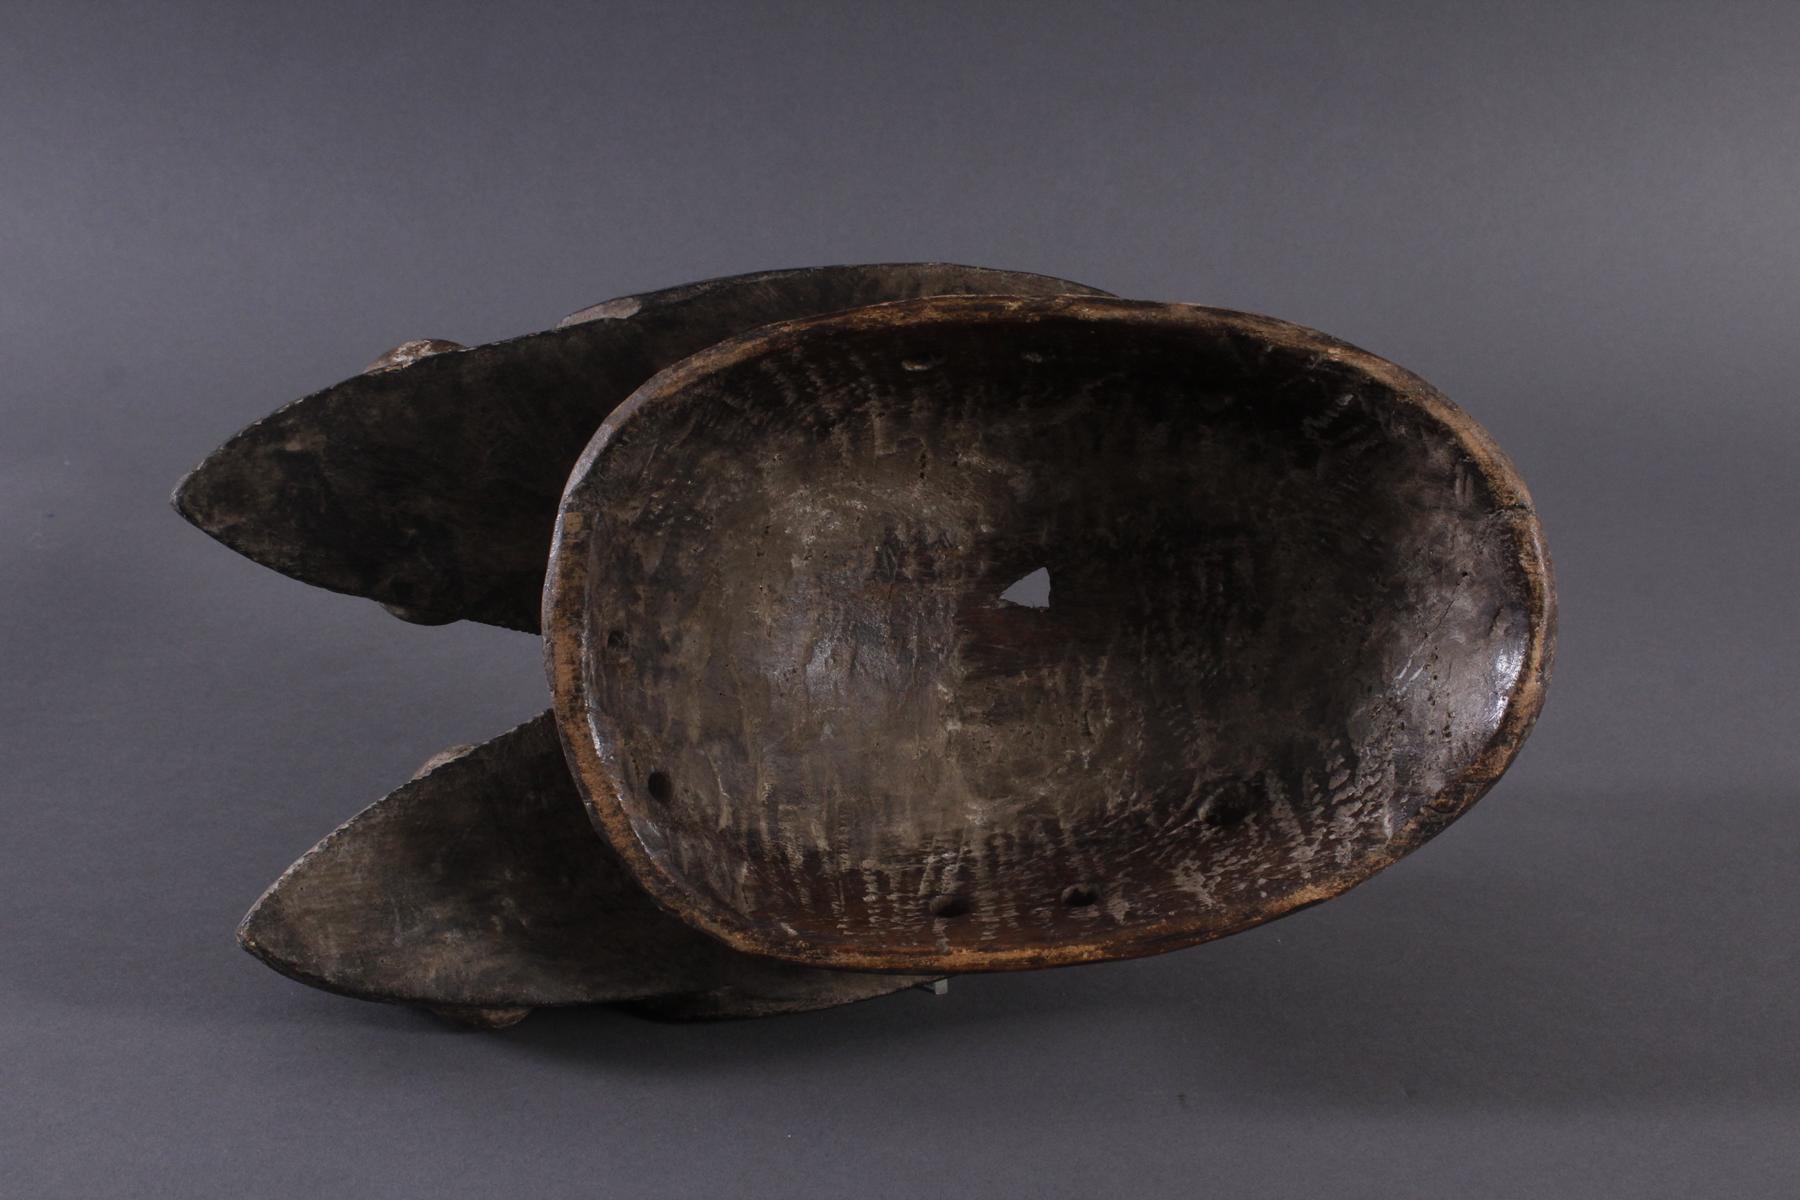 Antike Zwillingsmaske der Baule, Elfenbeinküste, 1. Hälfte 20. Jh.Holz geschnitzt, dunkle Patina. - Bild 6 aus 6